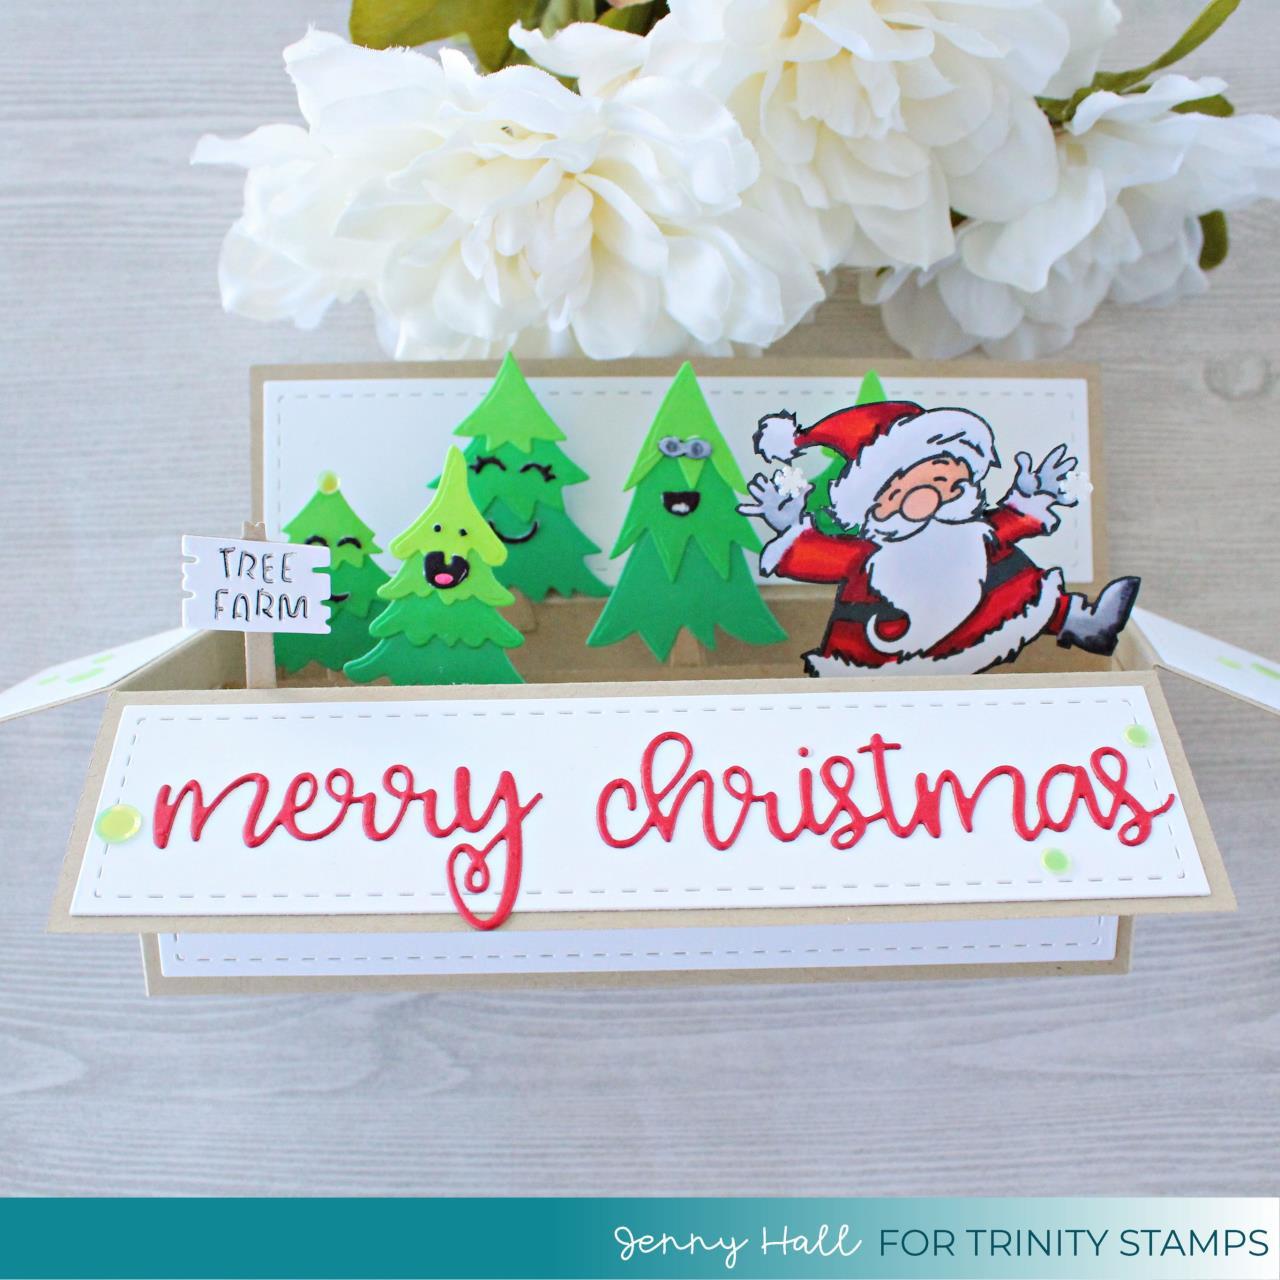 Slimline Wide Box Card, Trinity Stamps Dies -